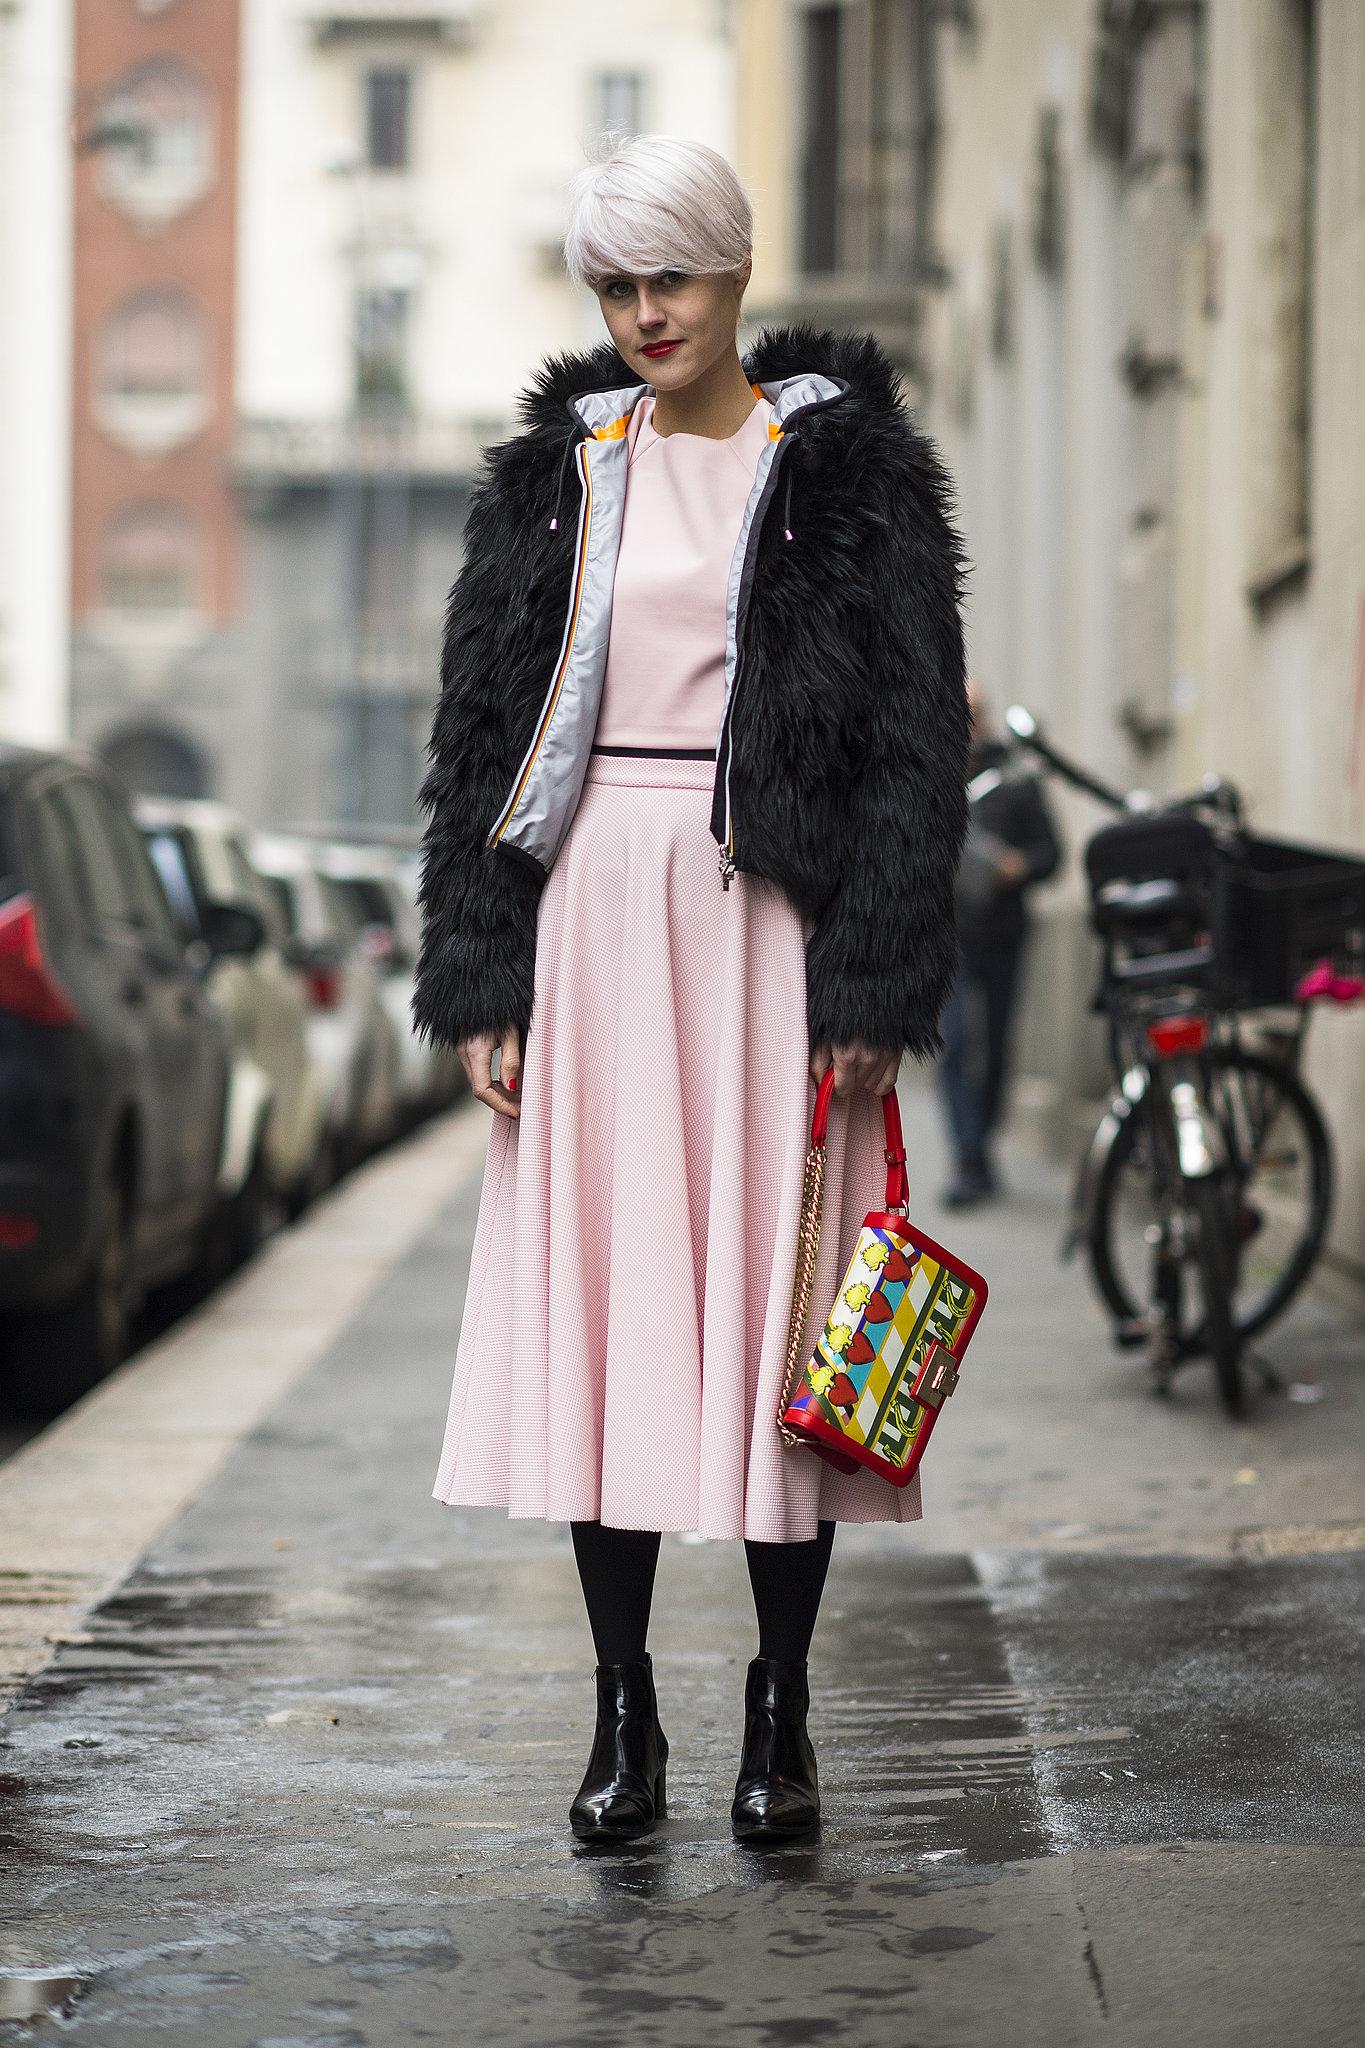 Petal pink goes surprisingly well with a dark fur, huh? Source: Le 21ème | Adam Katz Sinding